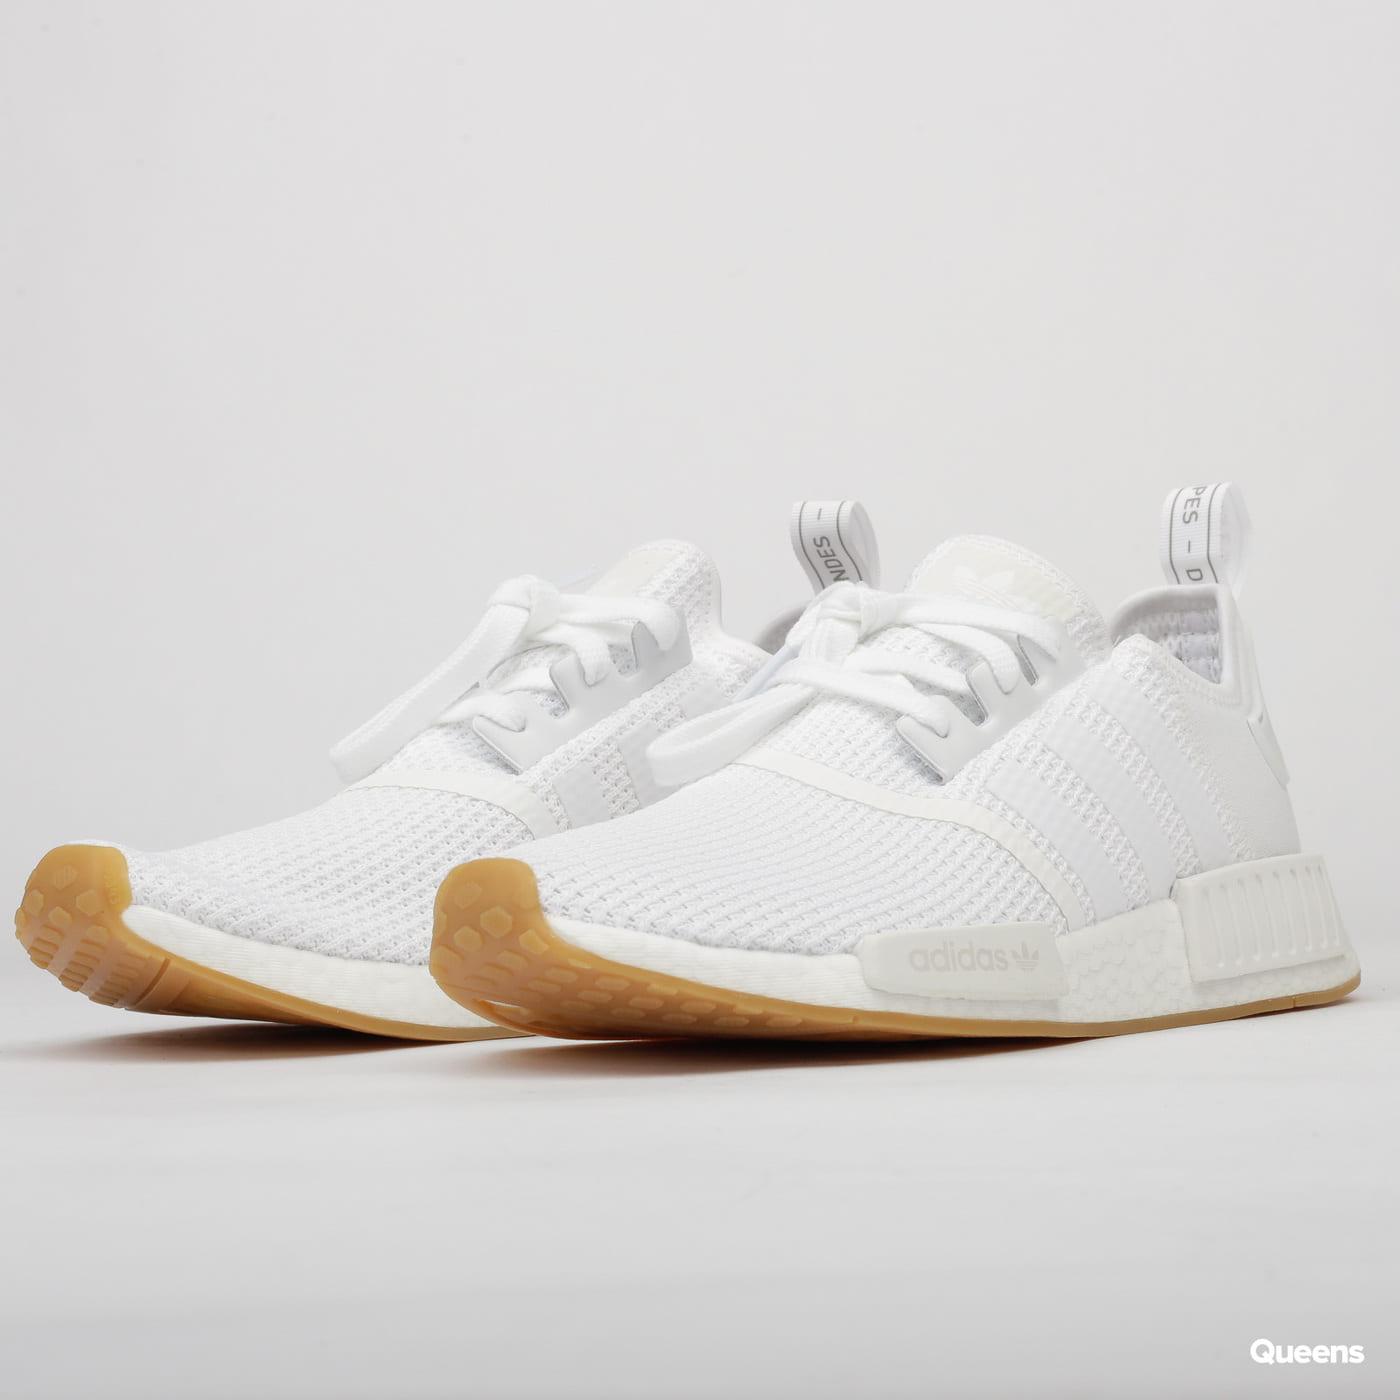 Sneakers Adidas Originals Nmd R1 Cloud White Cloud White